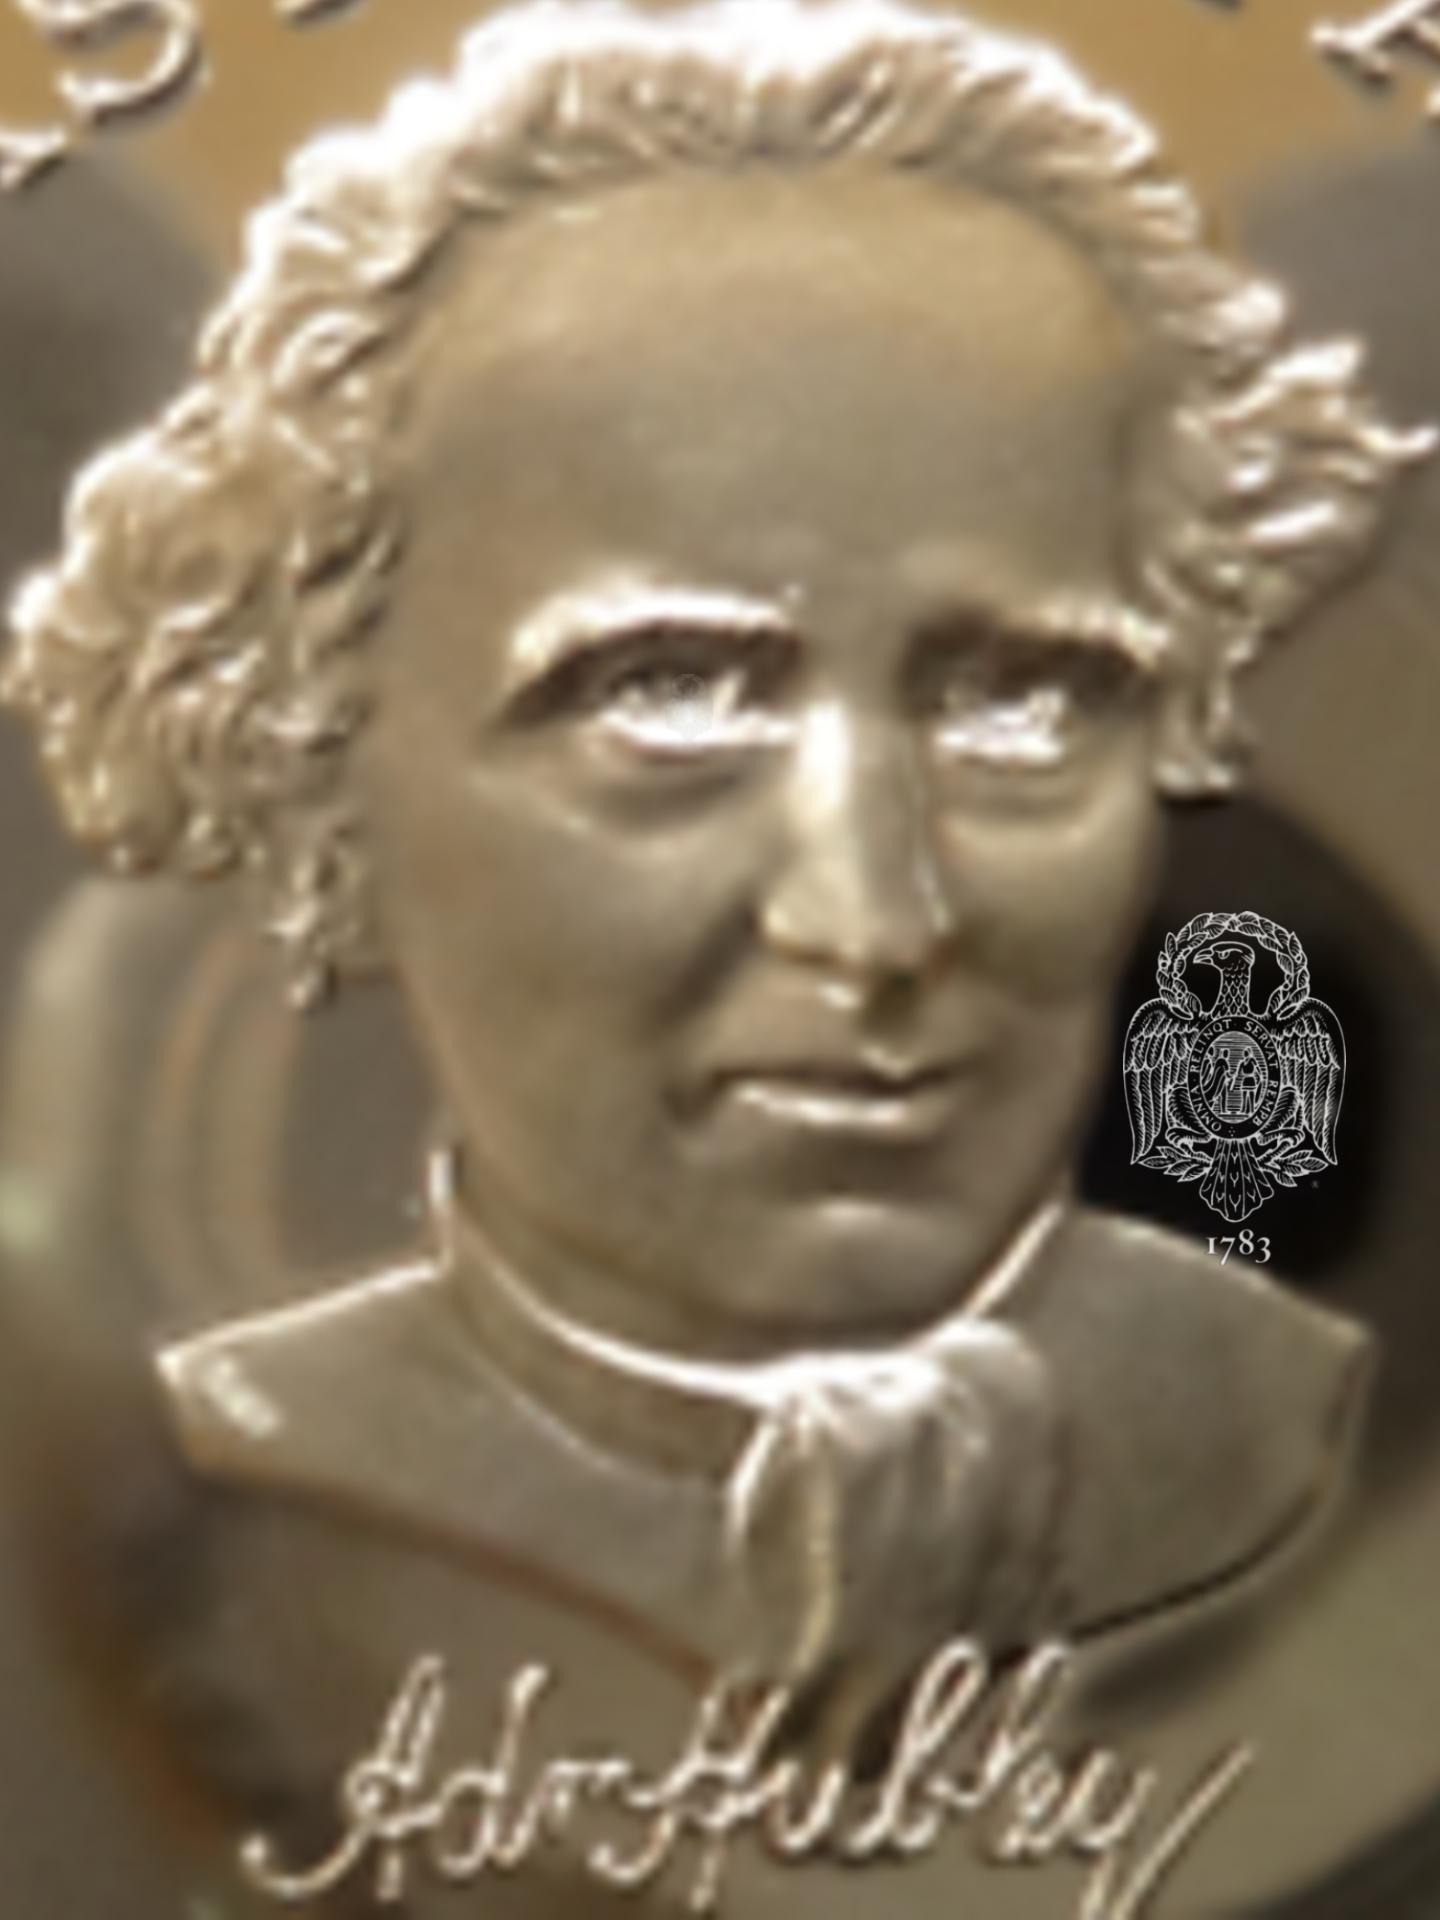 Lt. Col. Adam Hubley